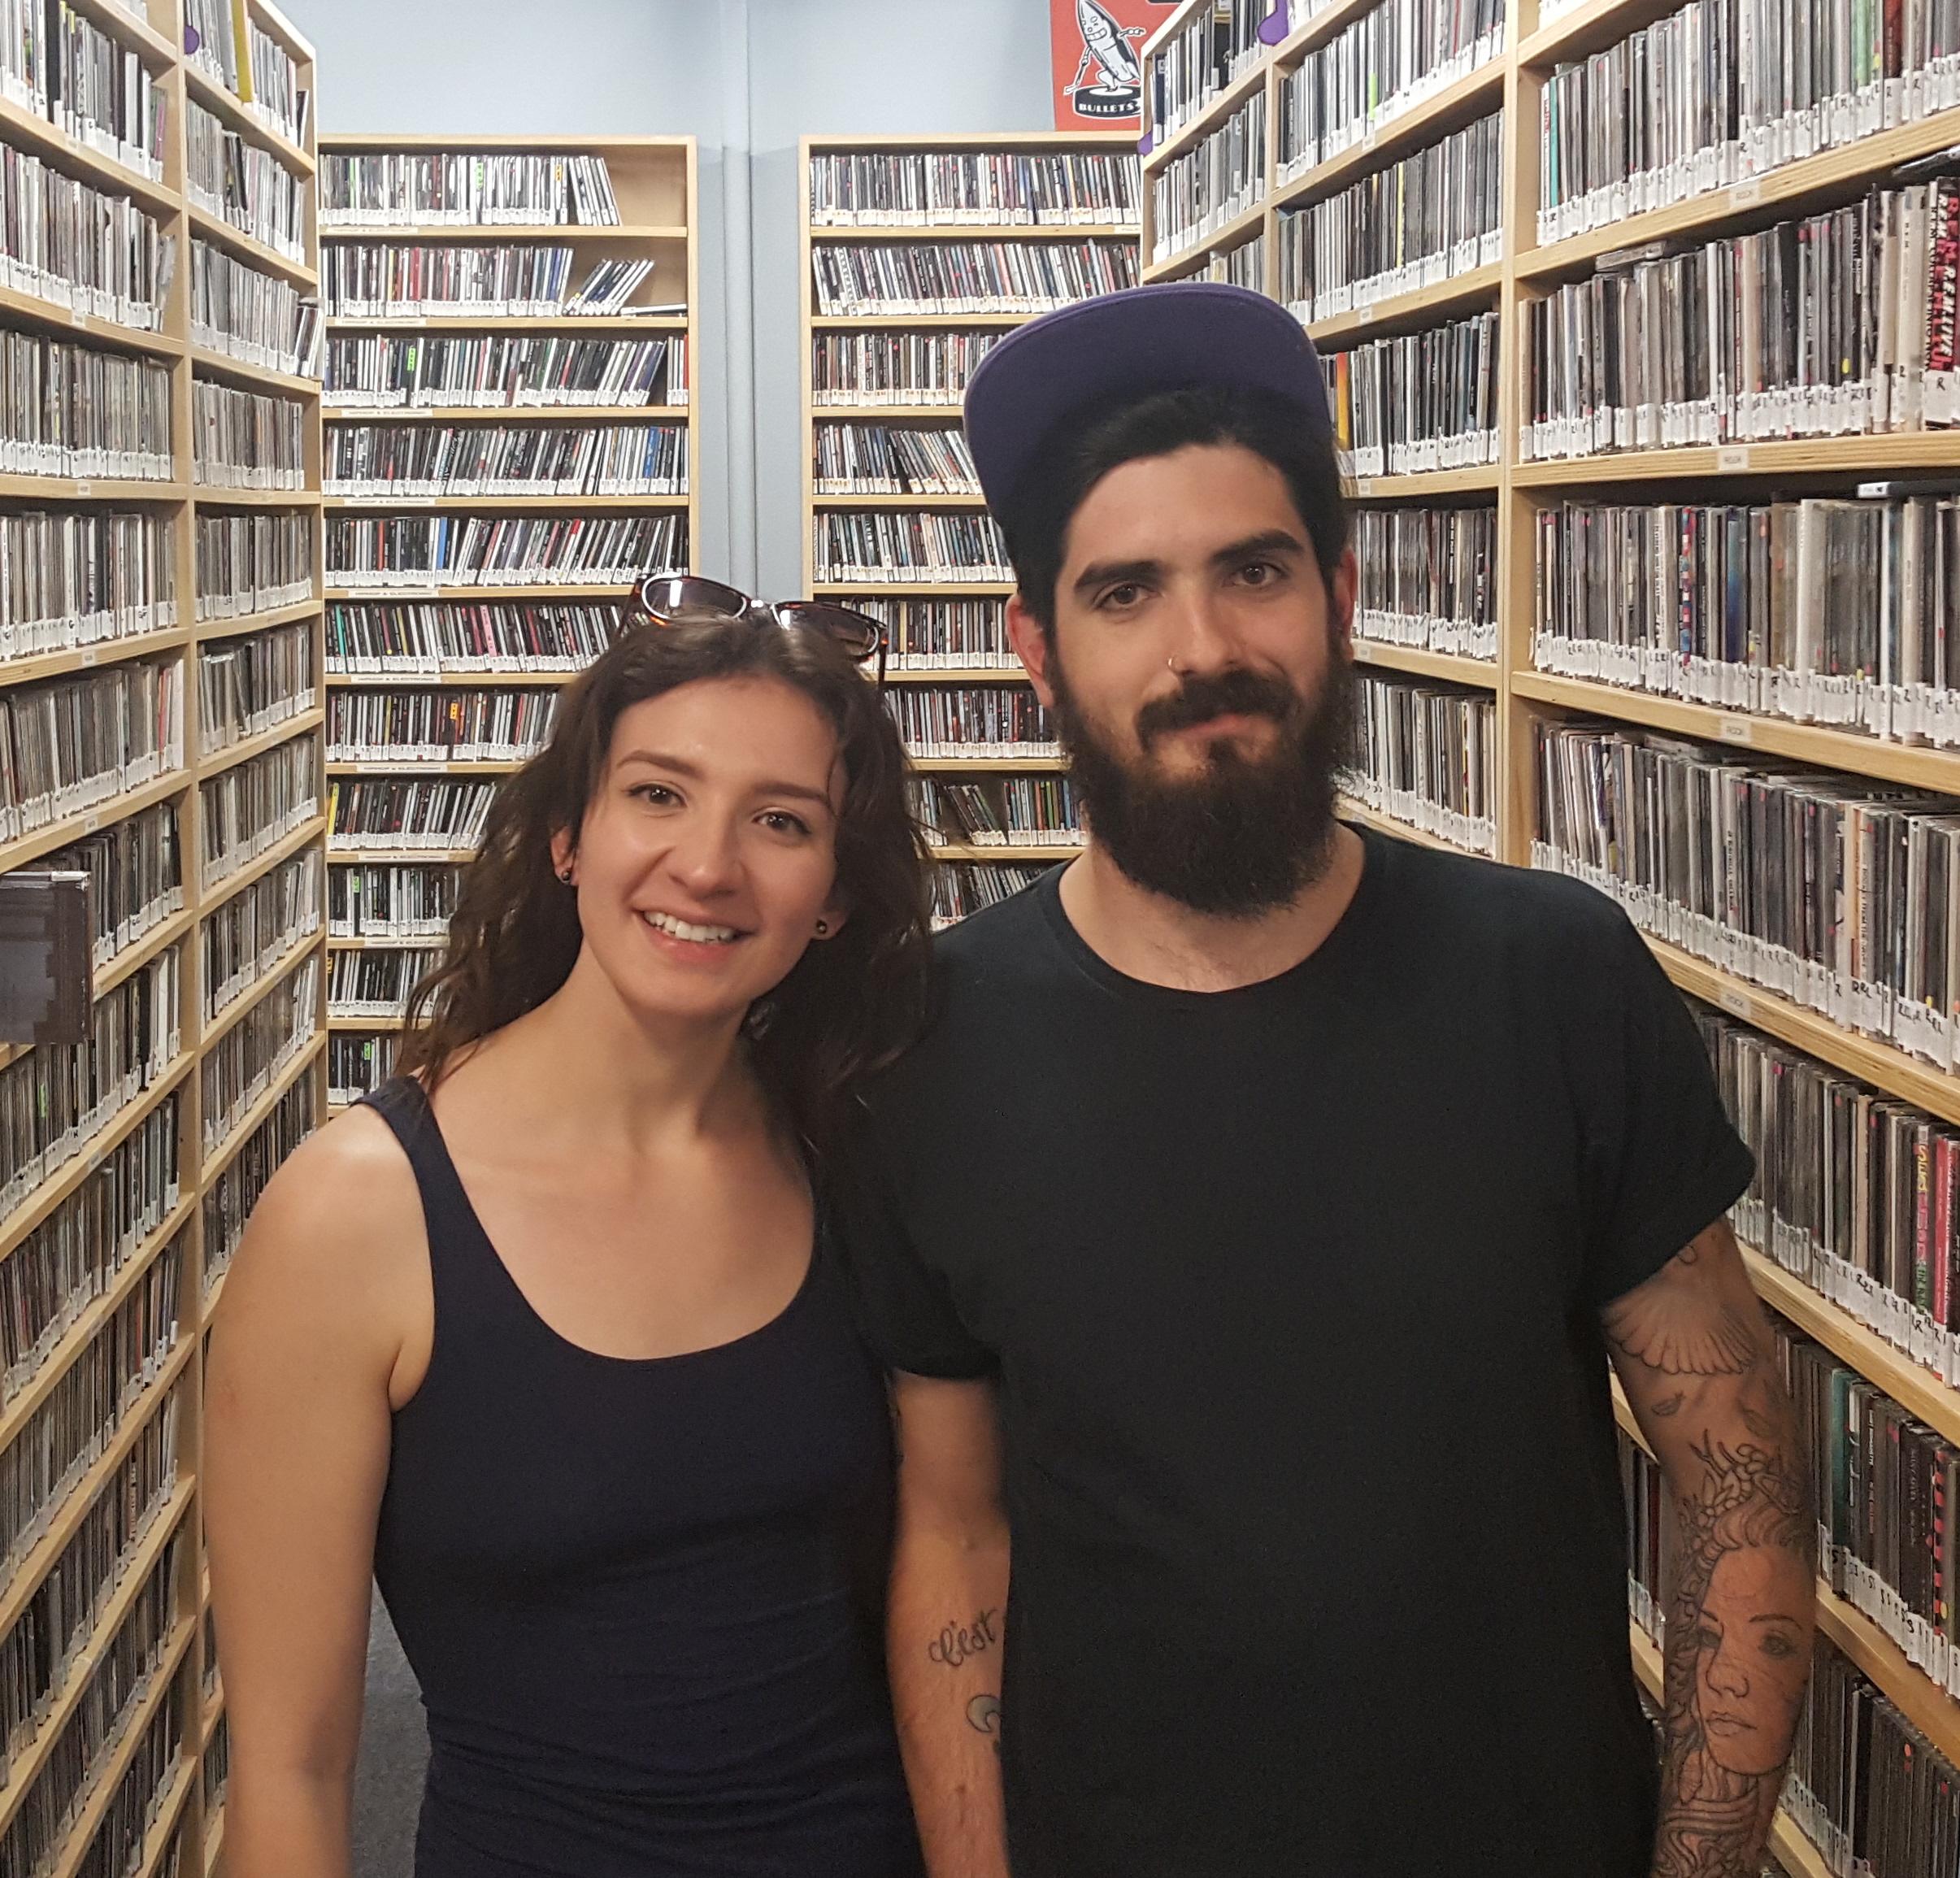 Ashley Bieniarz and Jacques Richer